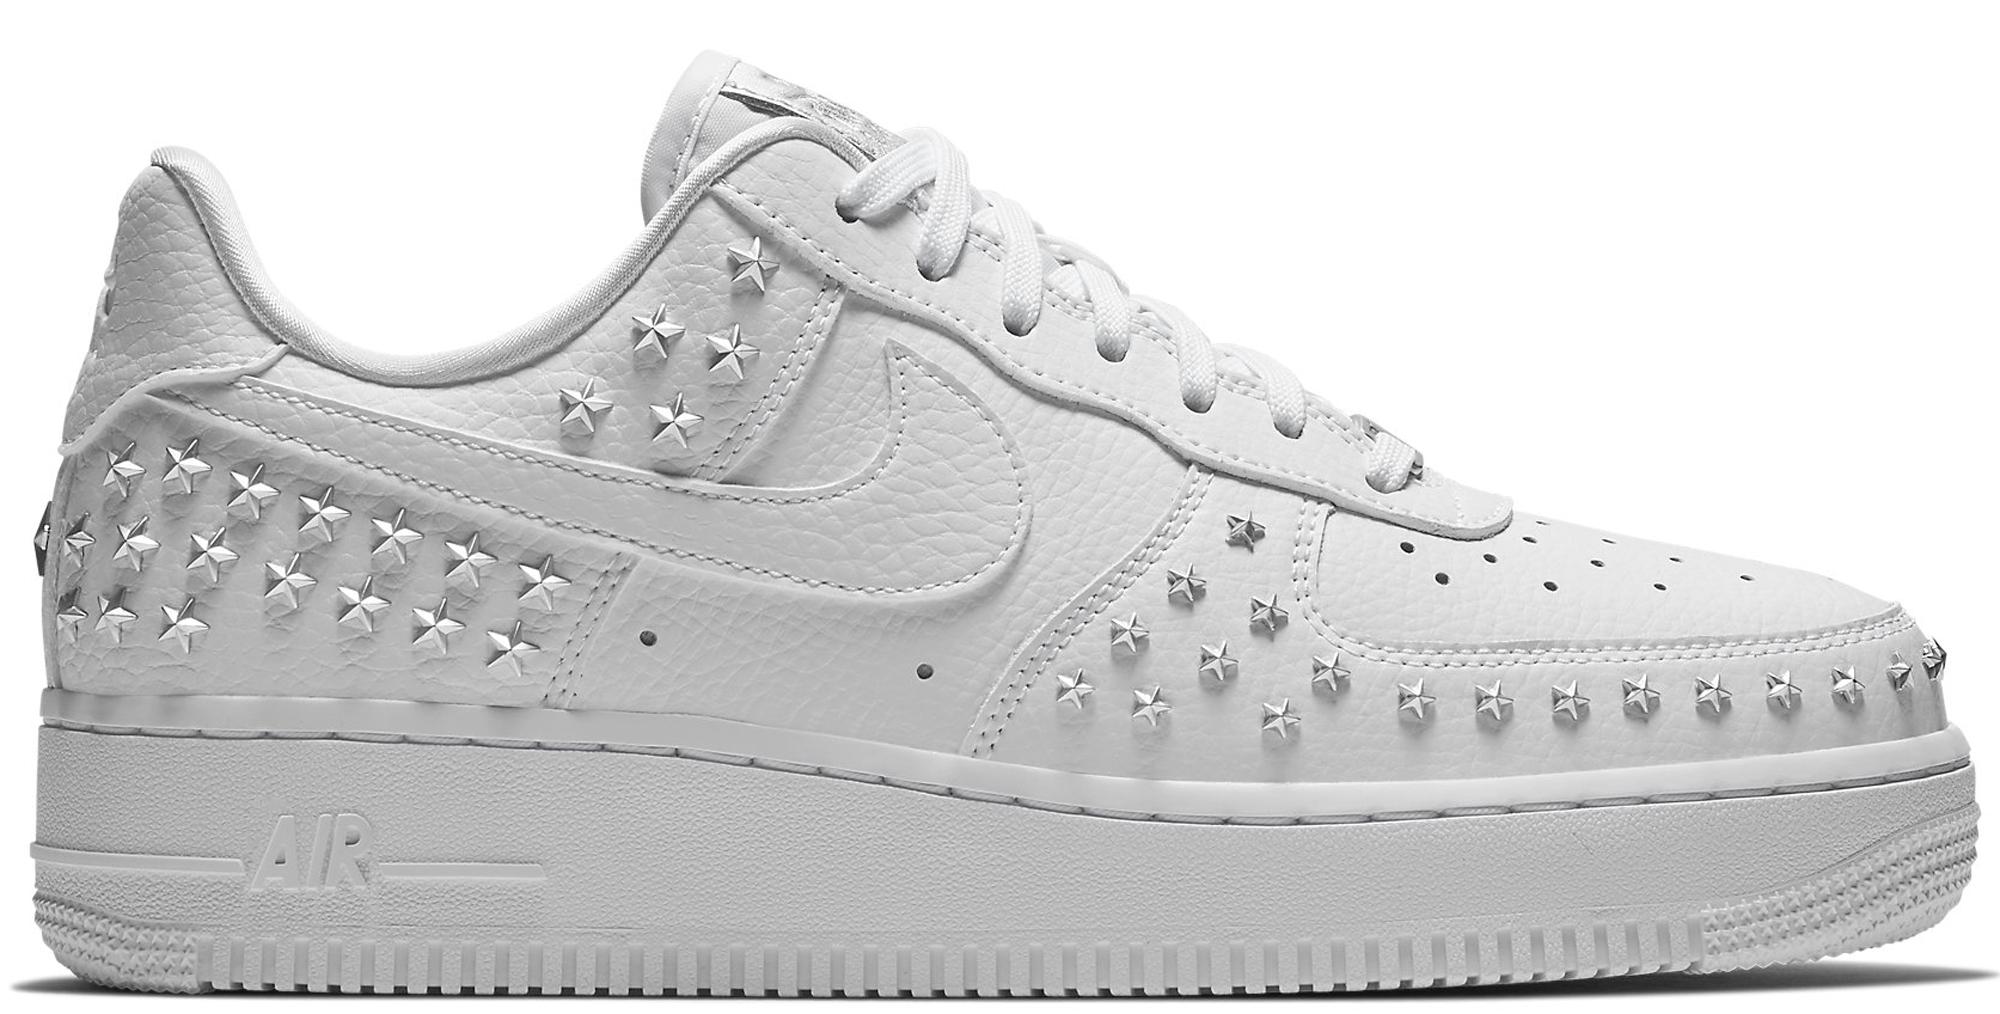 Nike Air Force 1 Low Stars White (W